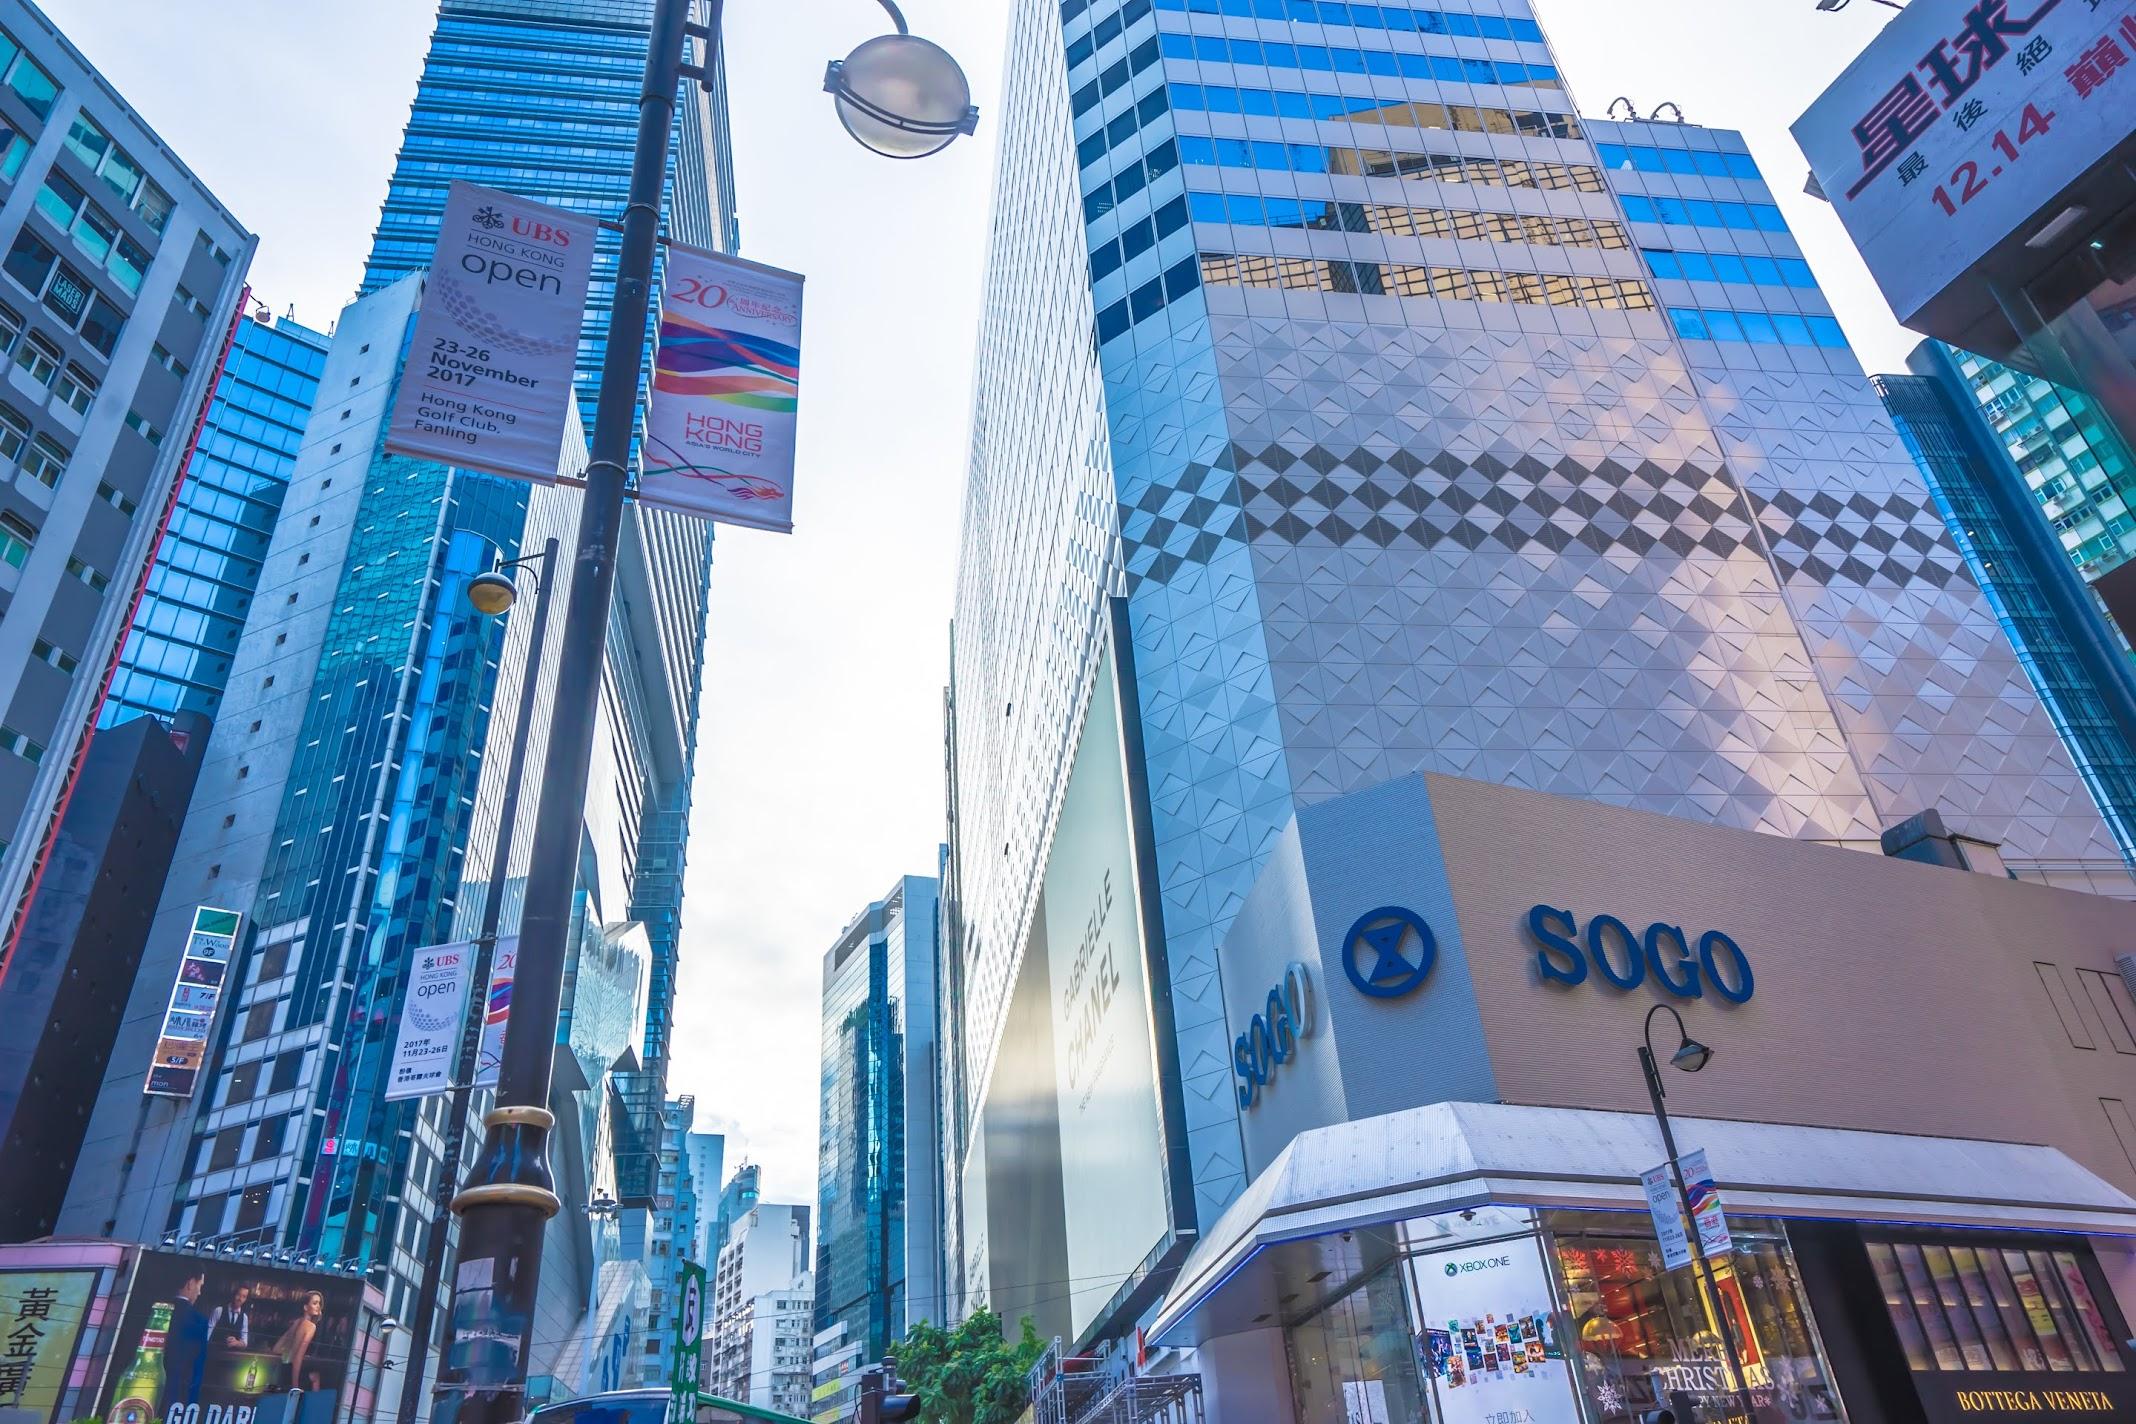 Hong Kong Causeway Bay SOGO